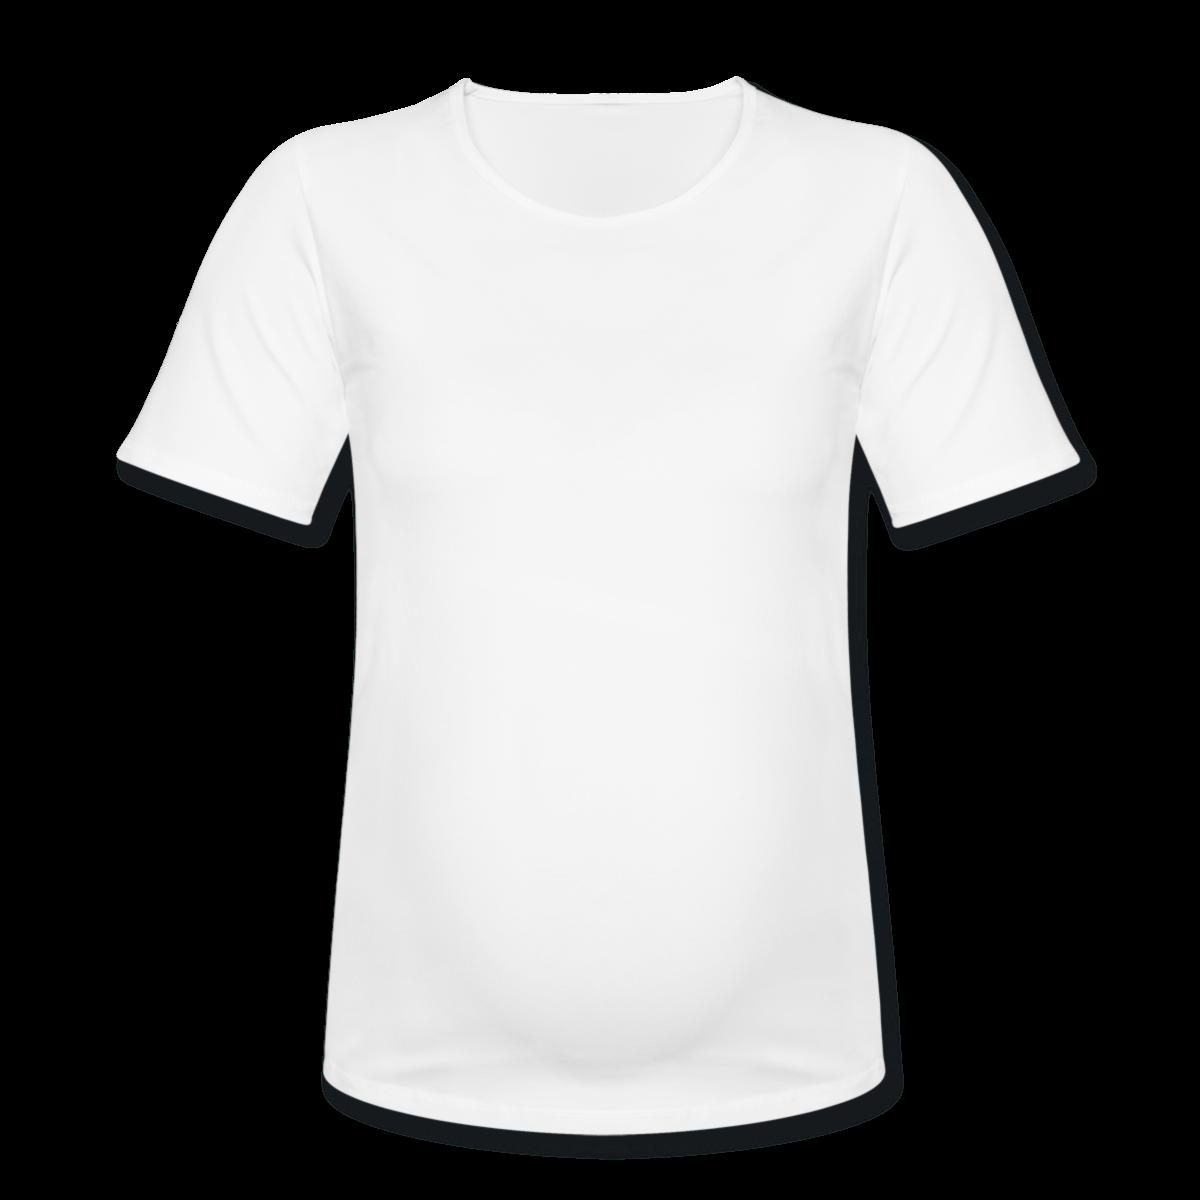 white blank t shirt clipart best